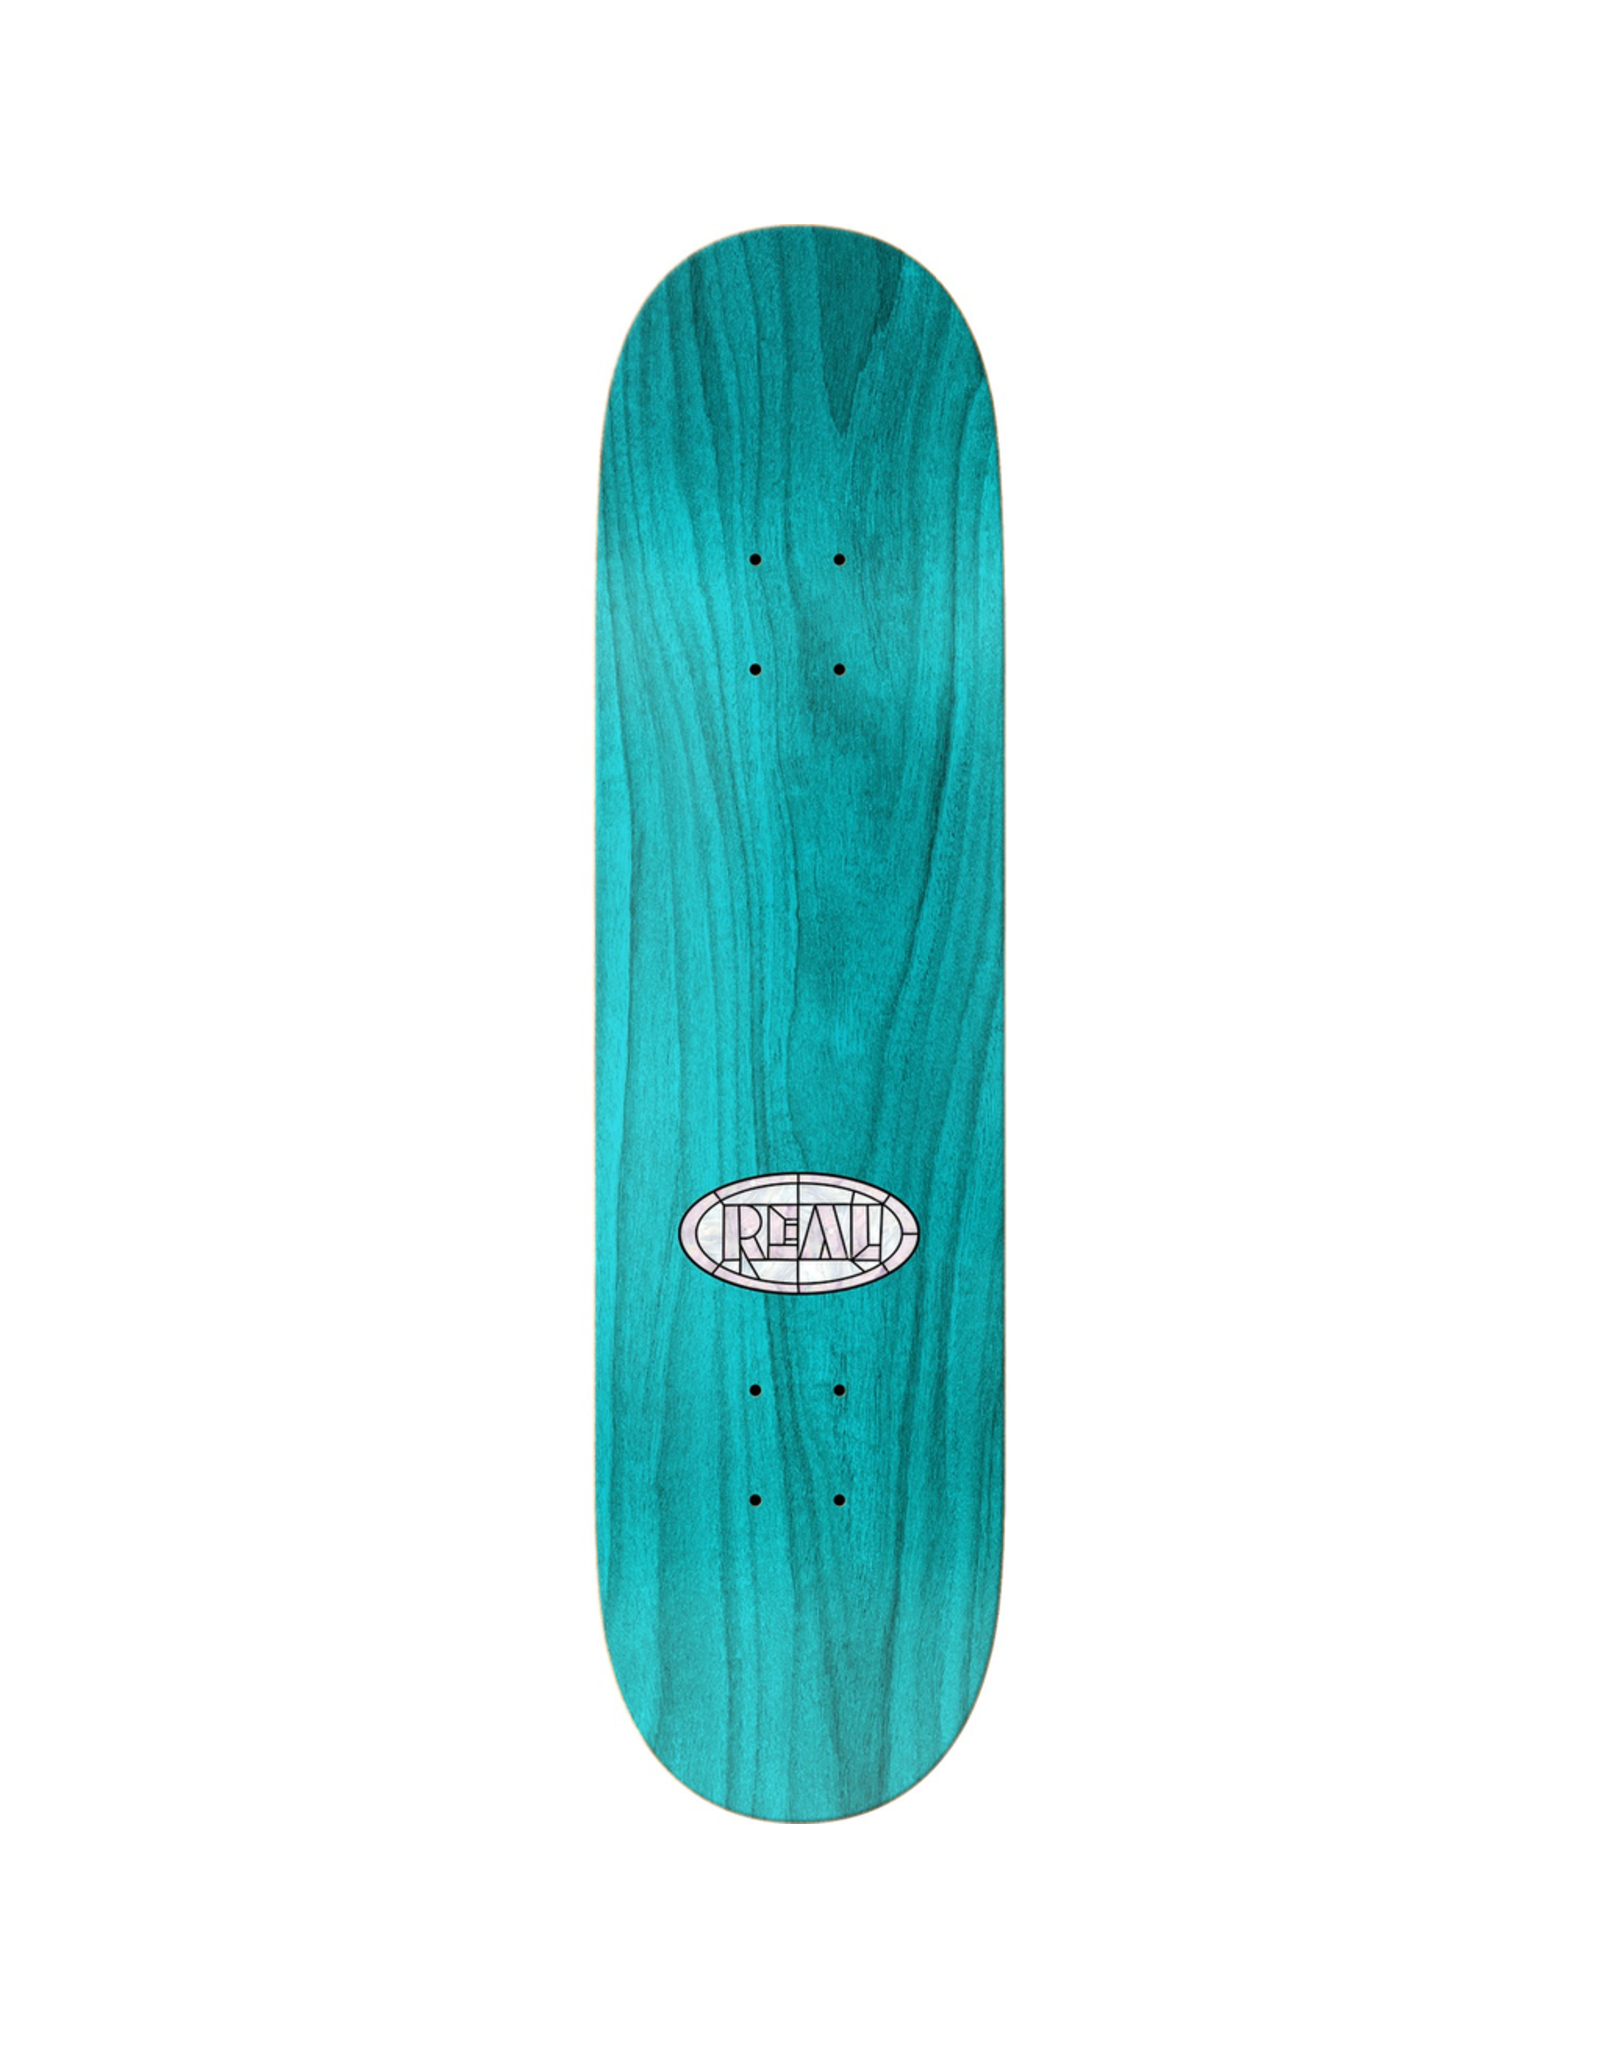 "REAL Real Skateboards Dennis Busenitz Cathedral Skateboard Deck - 8.06"" x 31.8"""